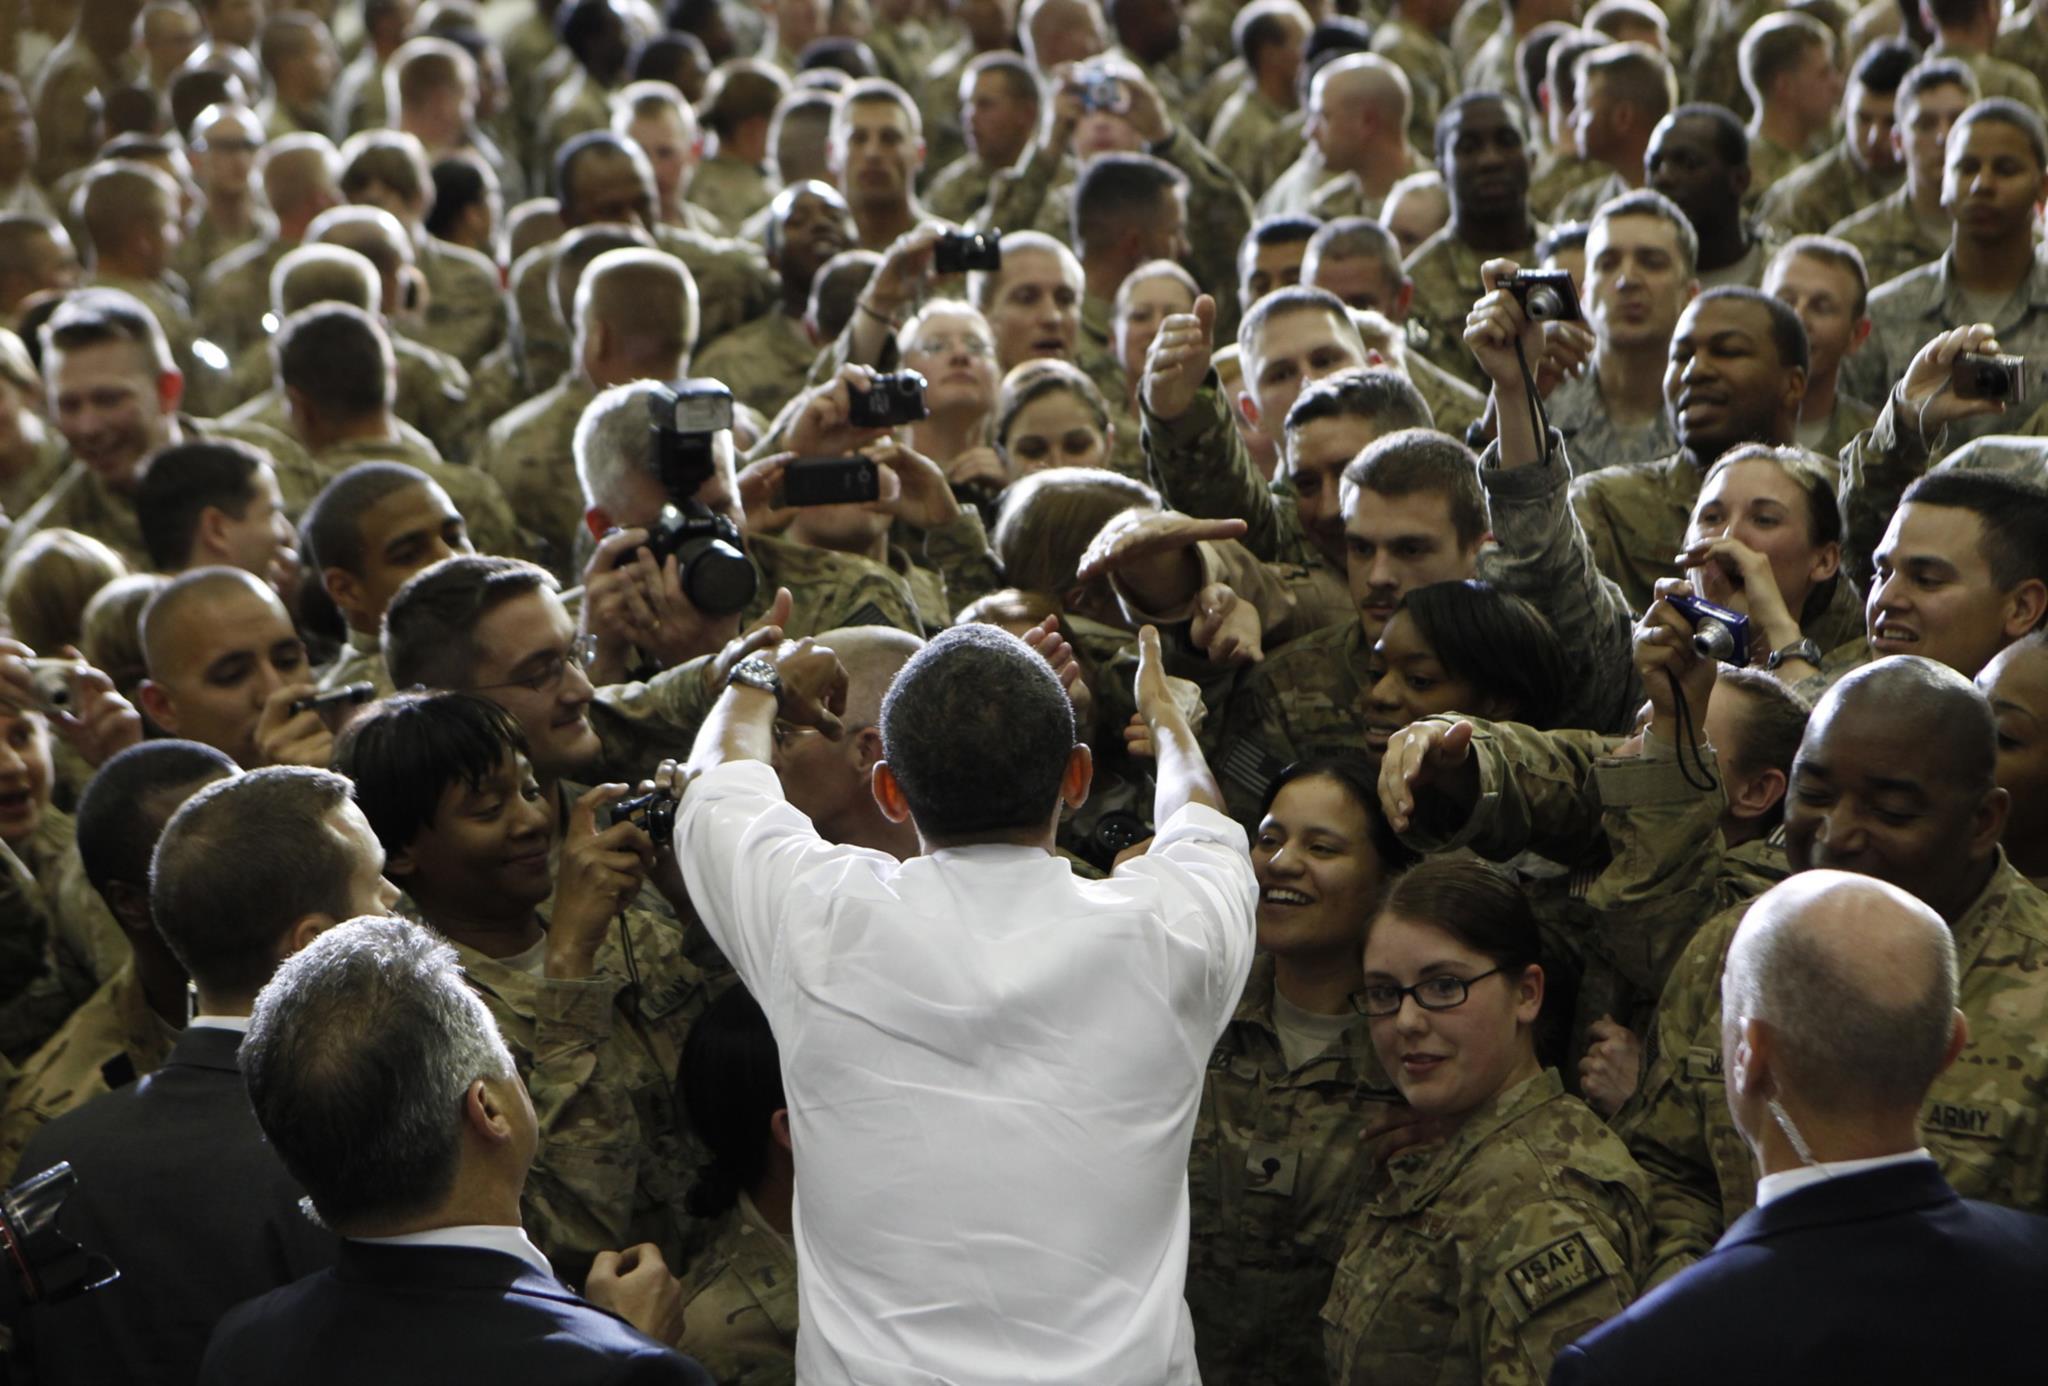 Obama cumprimenta membros da base aérea de Bagram, em Cabul, 2012